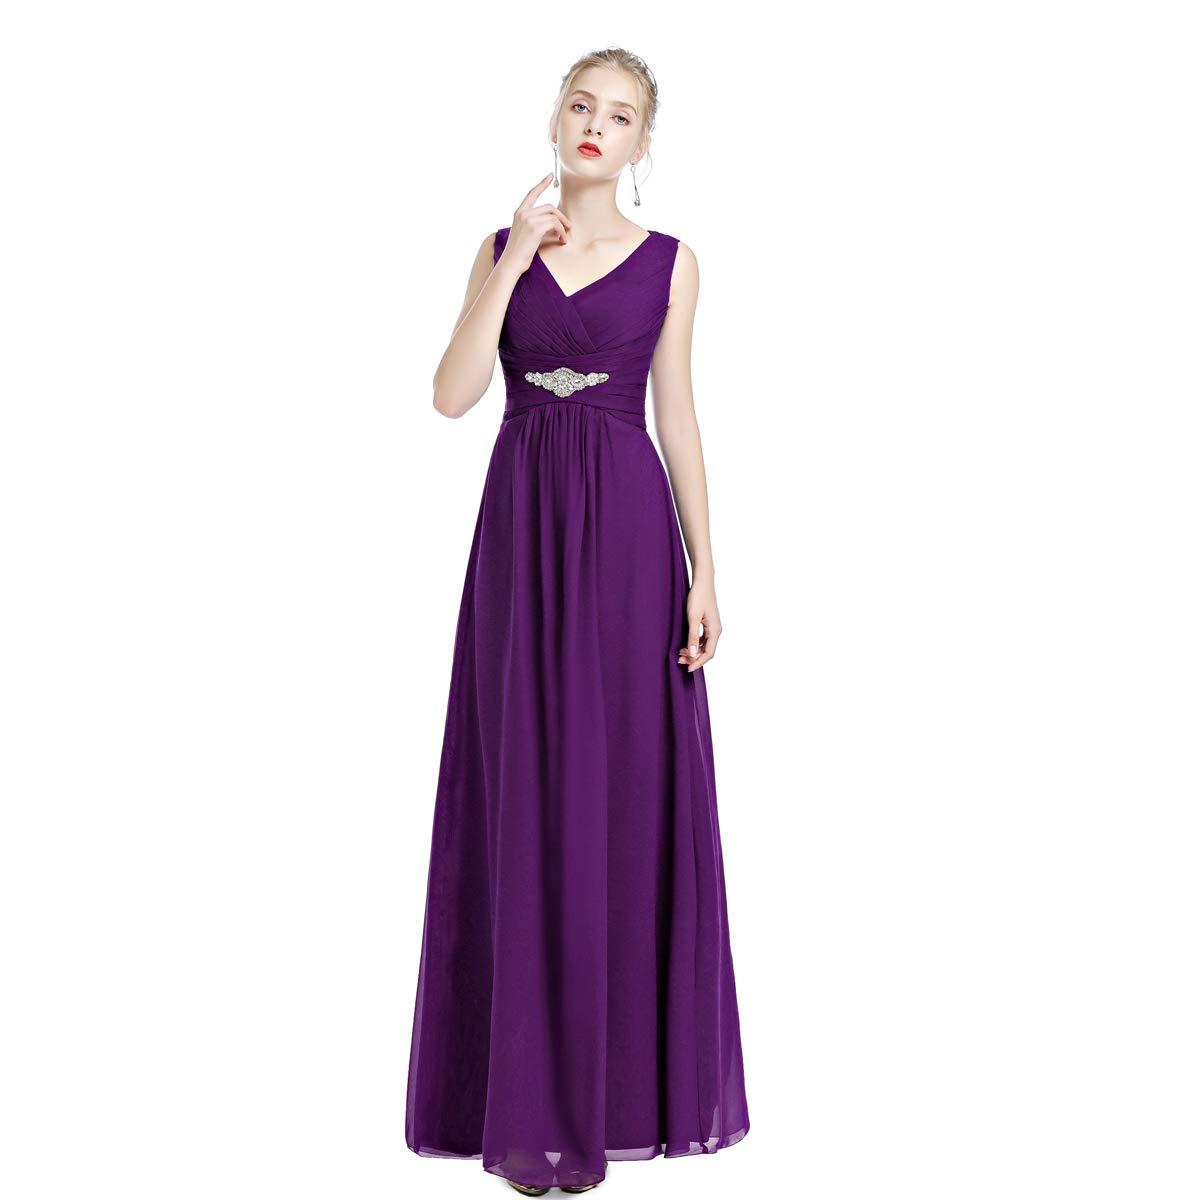 1db8f92f9d Women's Vintage Bridesmaid Formal Chiffon Wedding Prom Dress Sleeveless  V-Neck Spaghetti Strap Flowy Cocktail Evening Party Gowns Floor Length  A-line ...